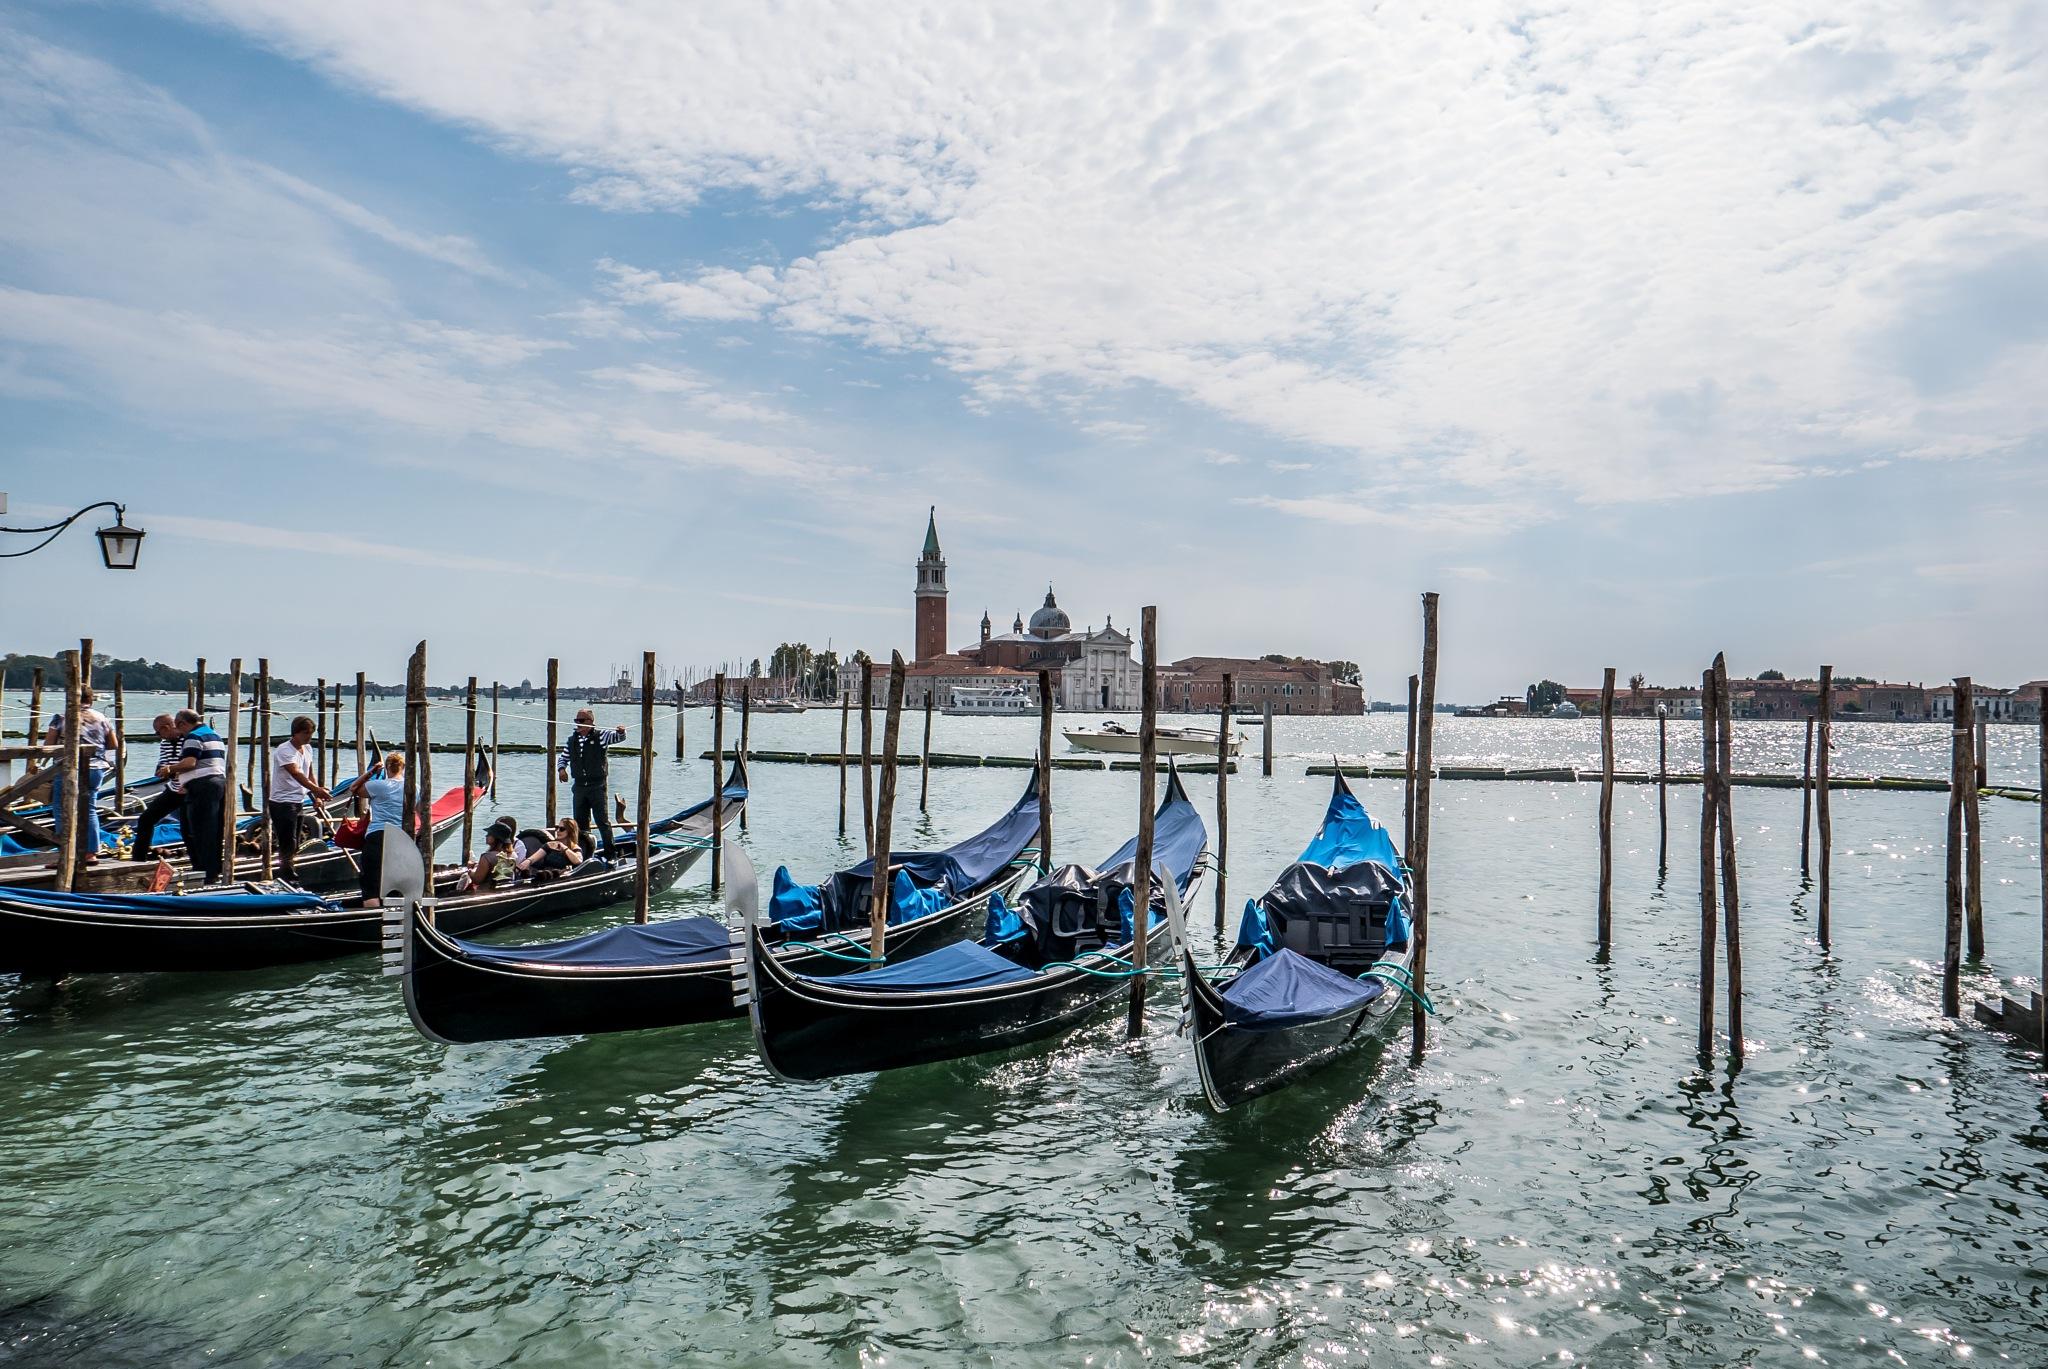 Classic Venice by Andrea Zork Abbà